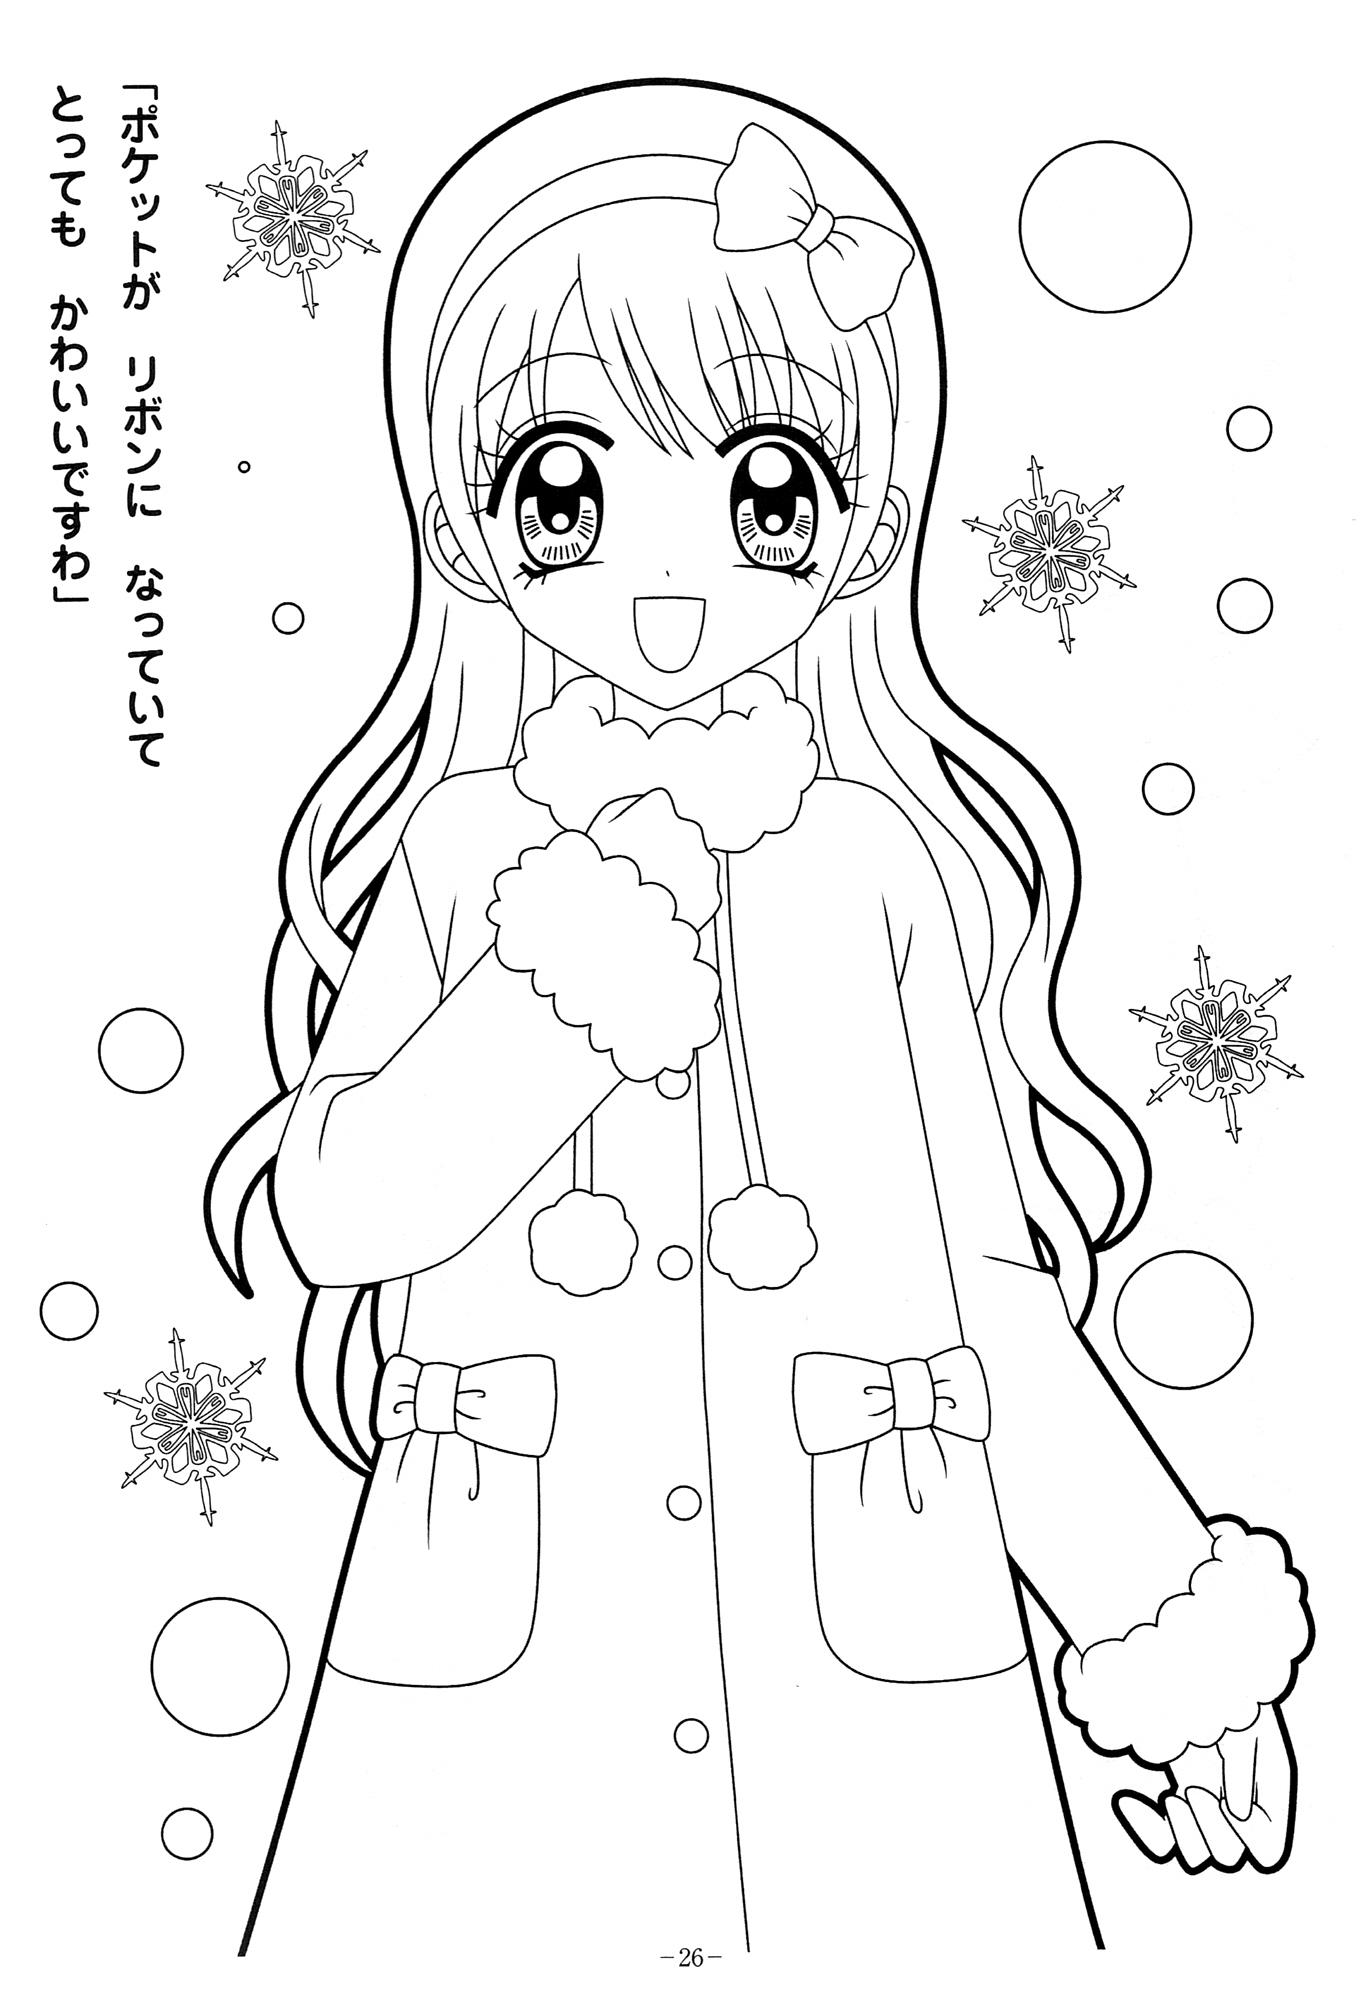 Beautiful Anime Girl Sketch Sketch Coloring Page Coloring Pages Of Beautiful Anime